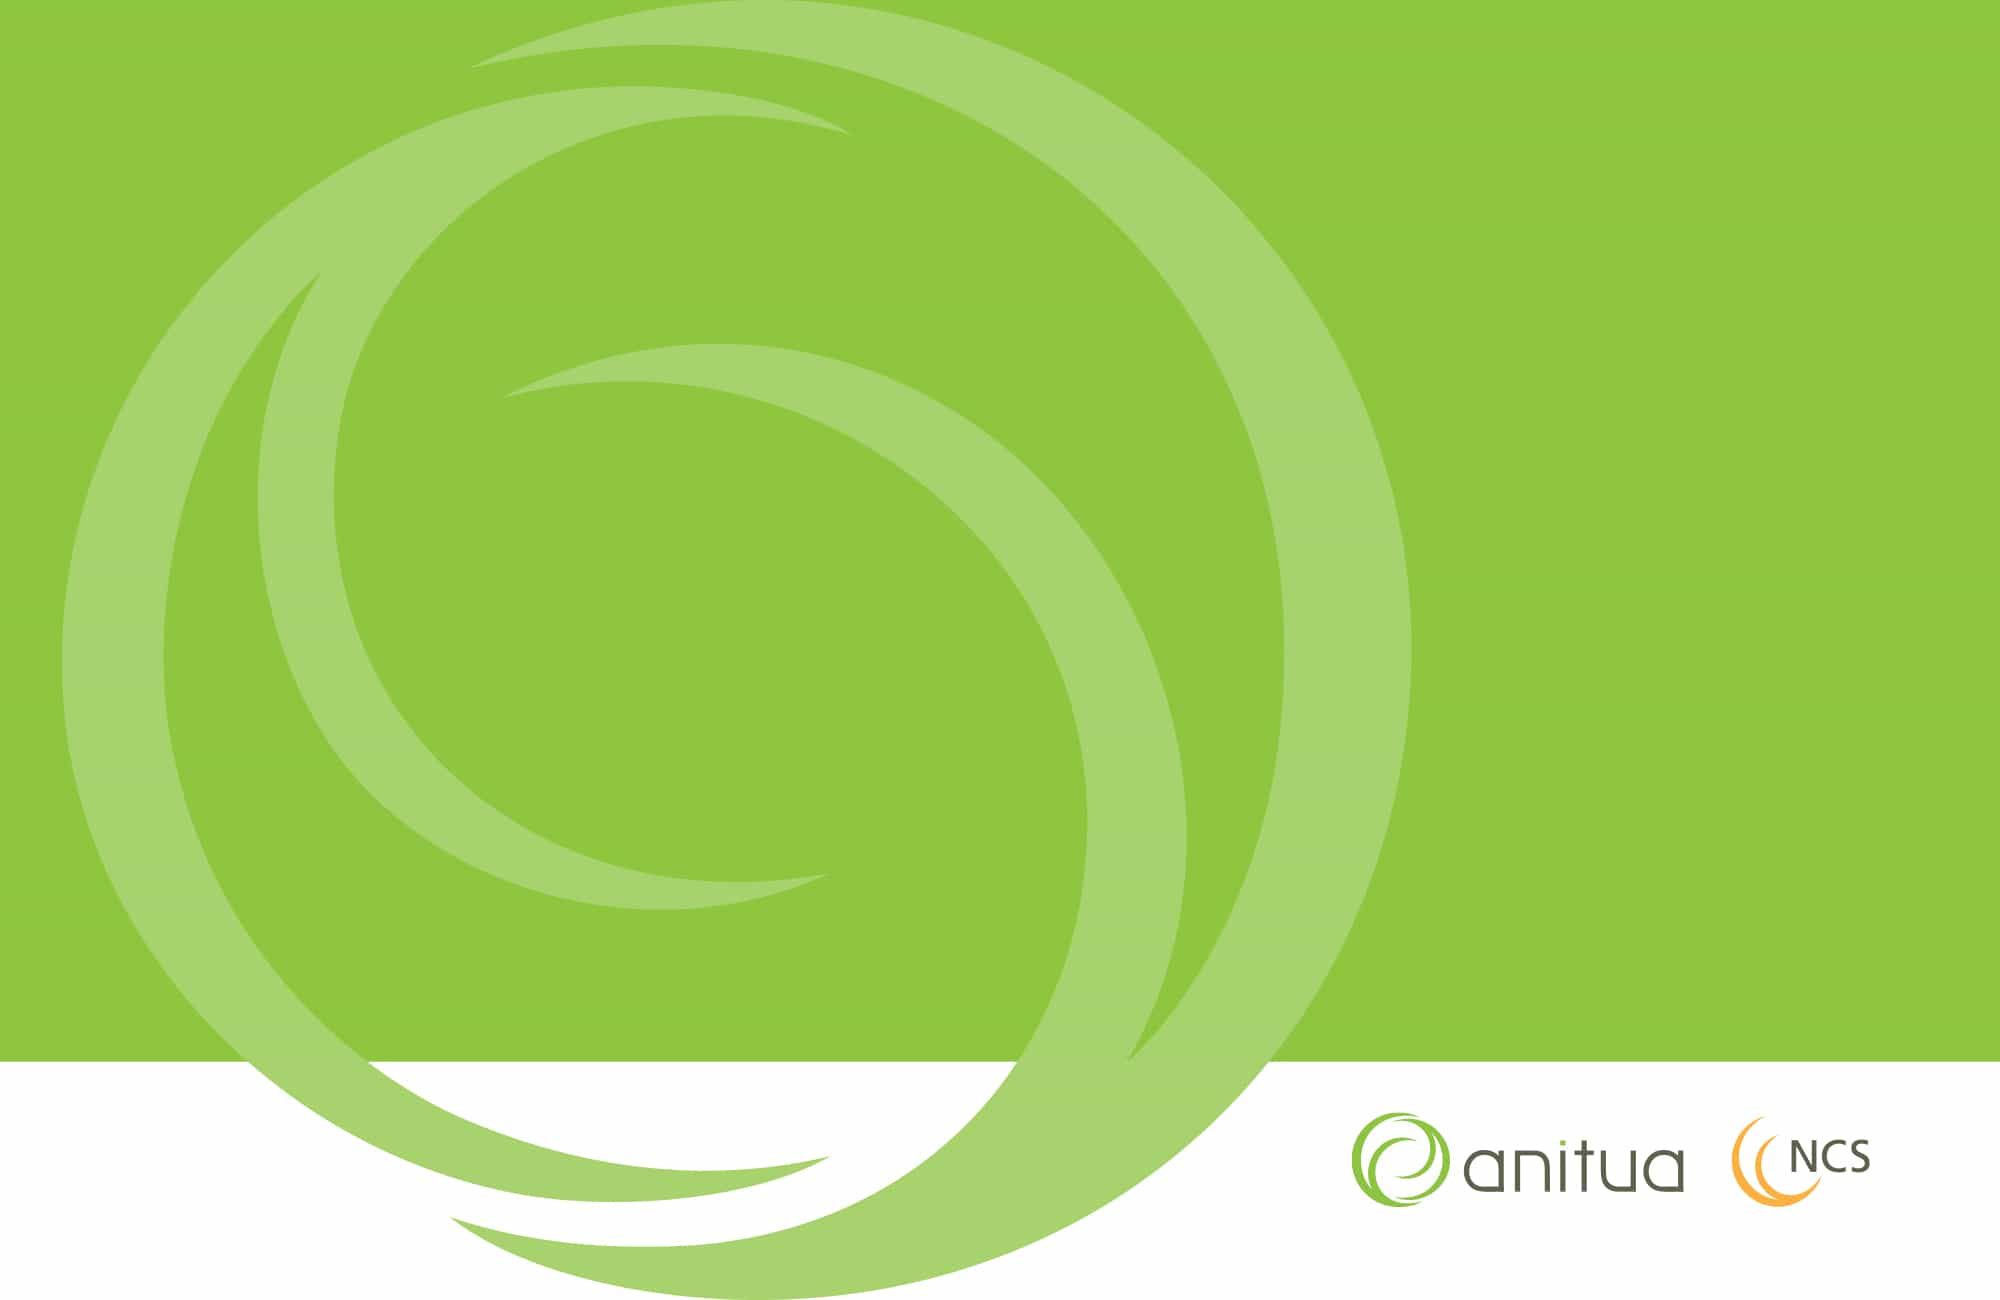 Anitua & NCS